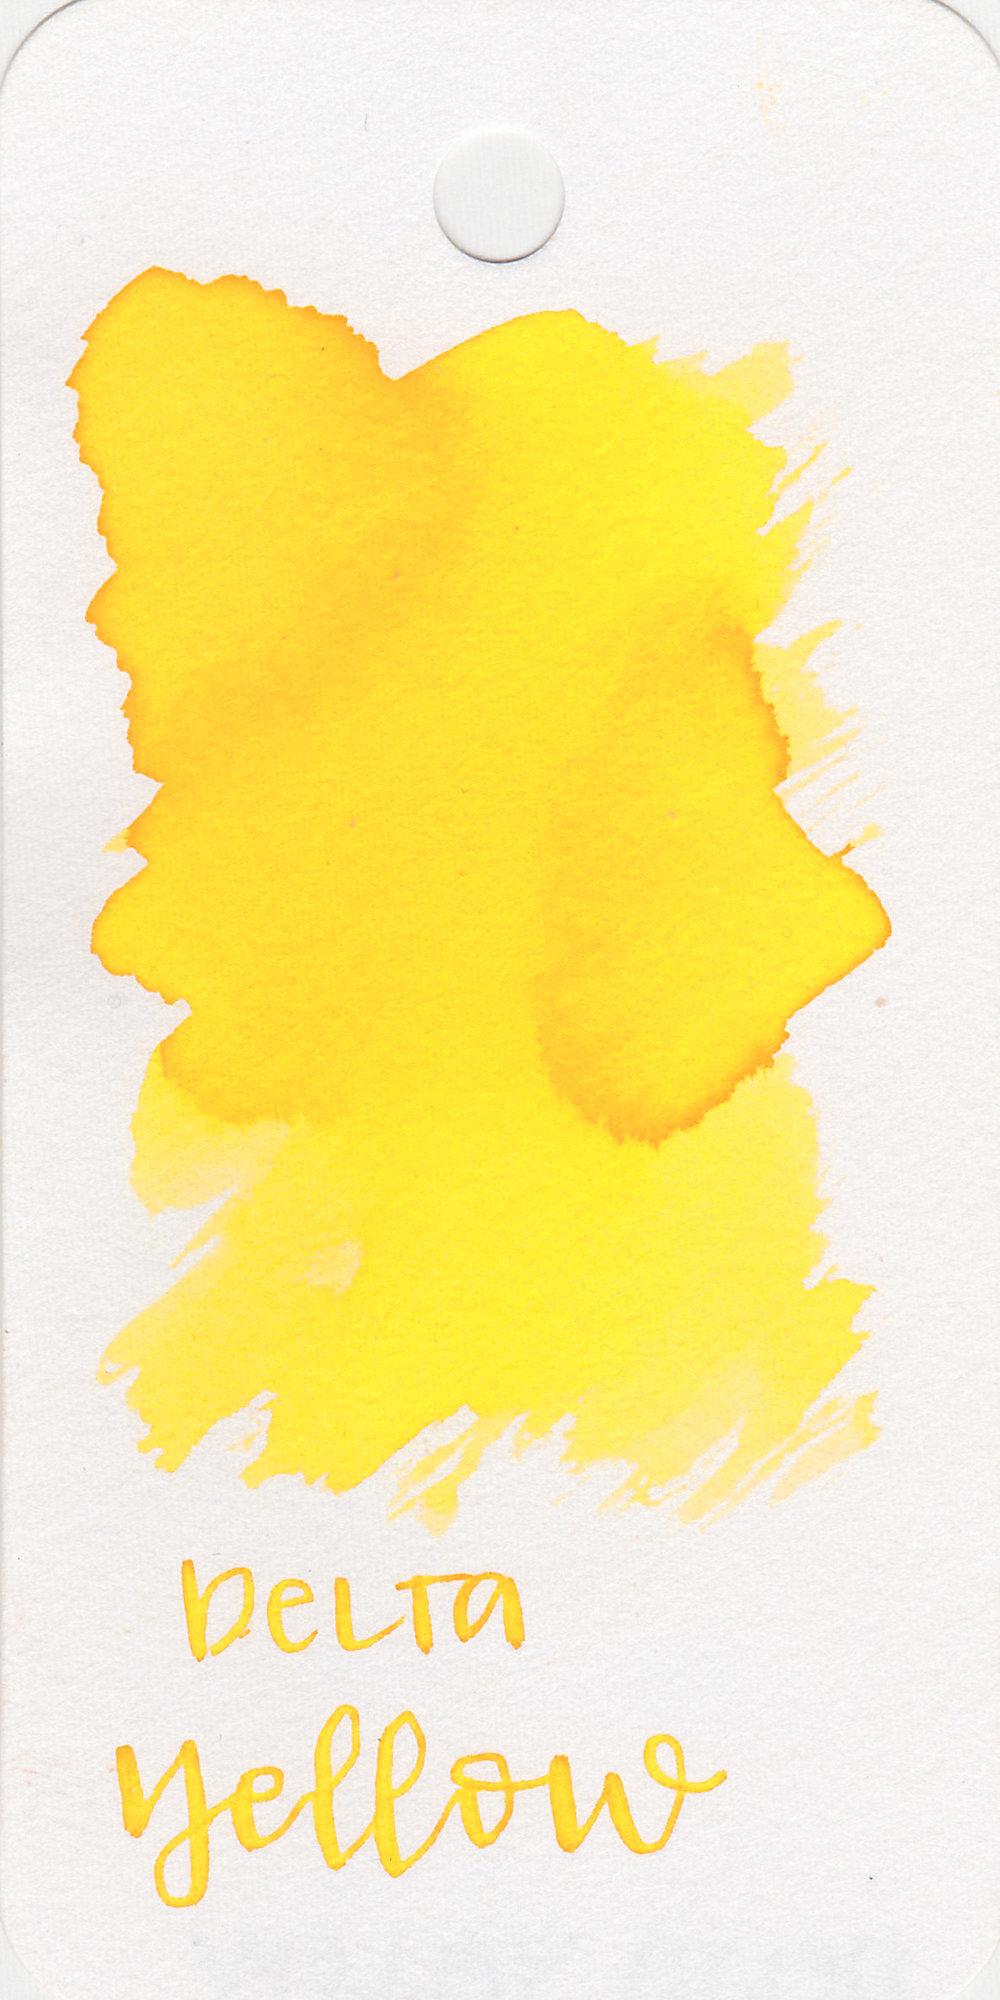 dt-yellow-1.jpg